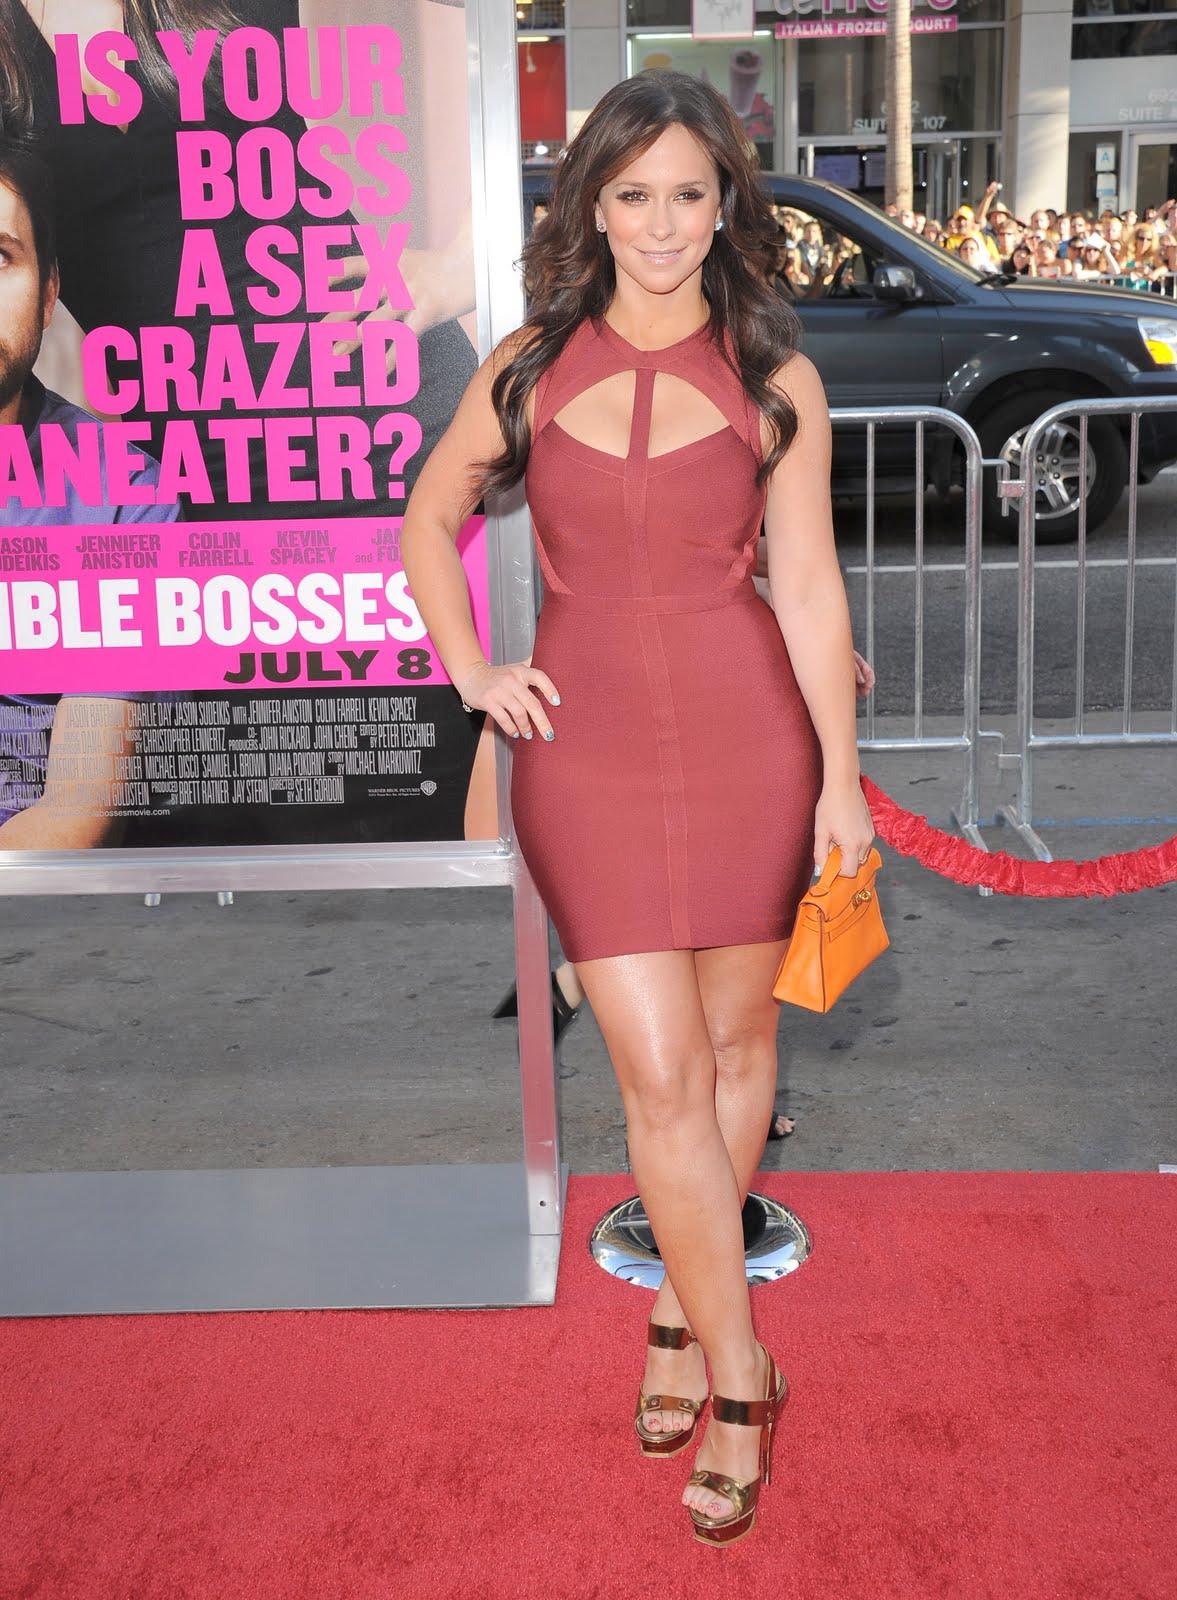 http://3.bp.blogspot.com/-eADeZAgjeUk/Tg7NIak9bjI/AAAAAAAAEKU/QgjzkE2hKzo/s1600/sploogeblog_jennifer_love_hewitt_cleavage_ass_minidress_06.jpg